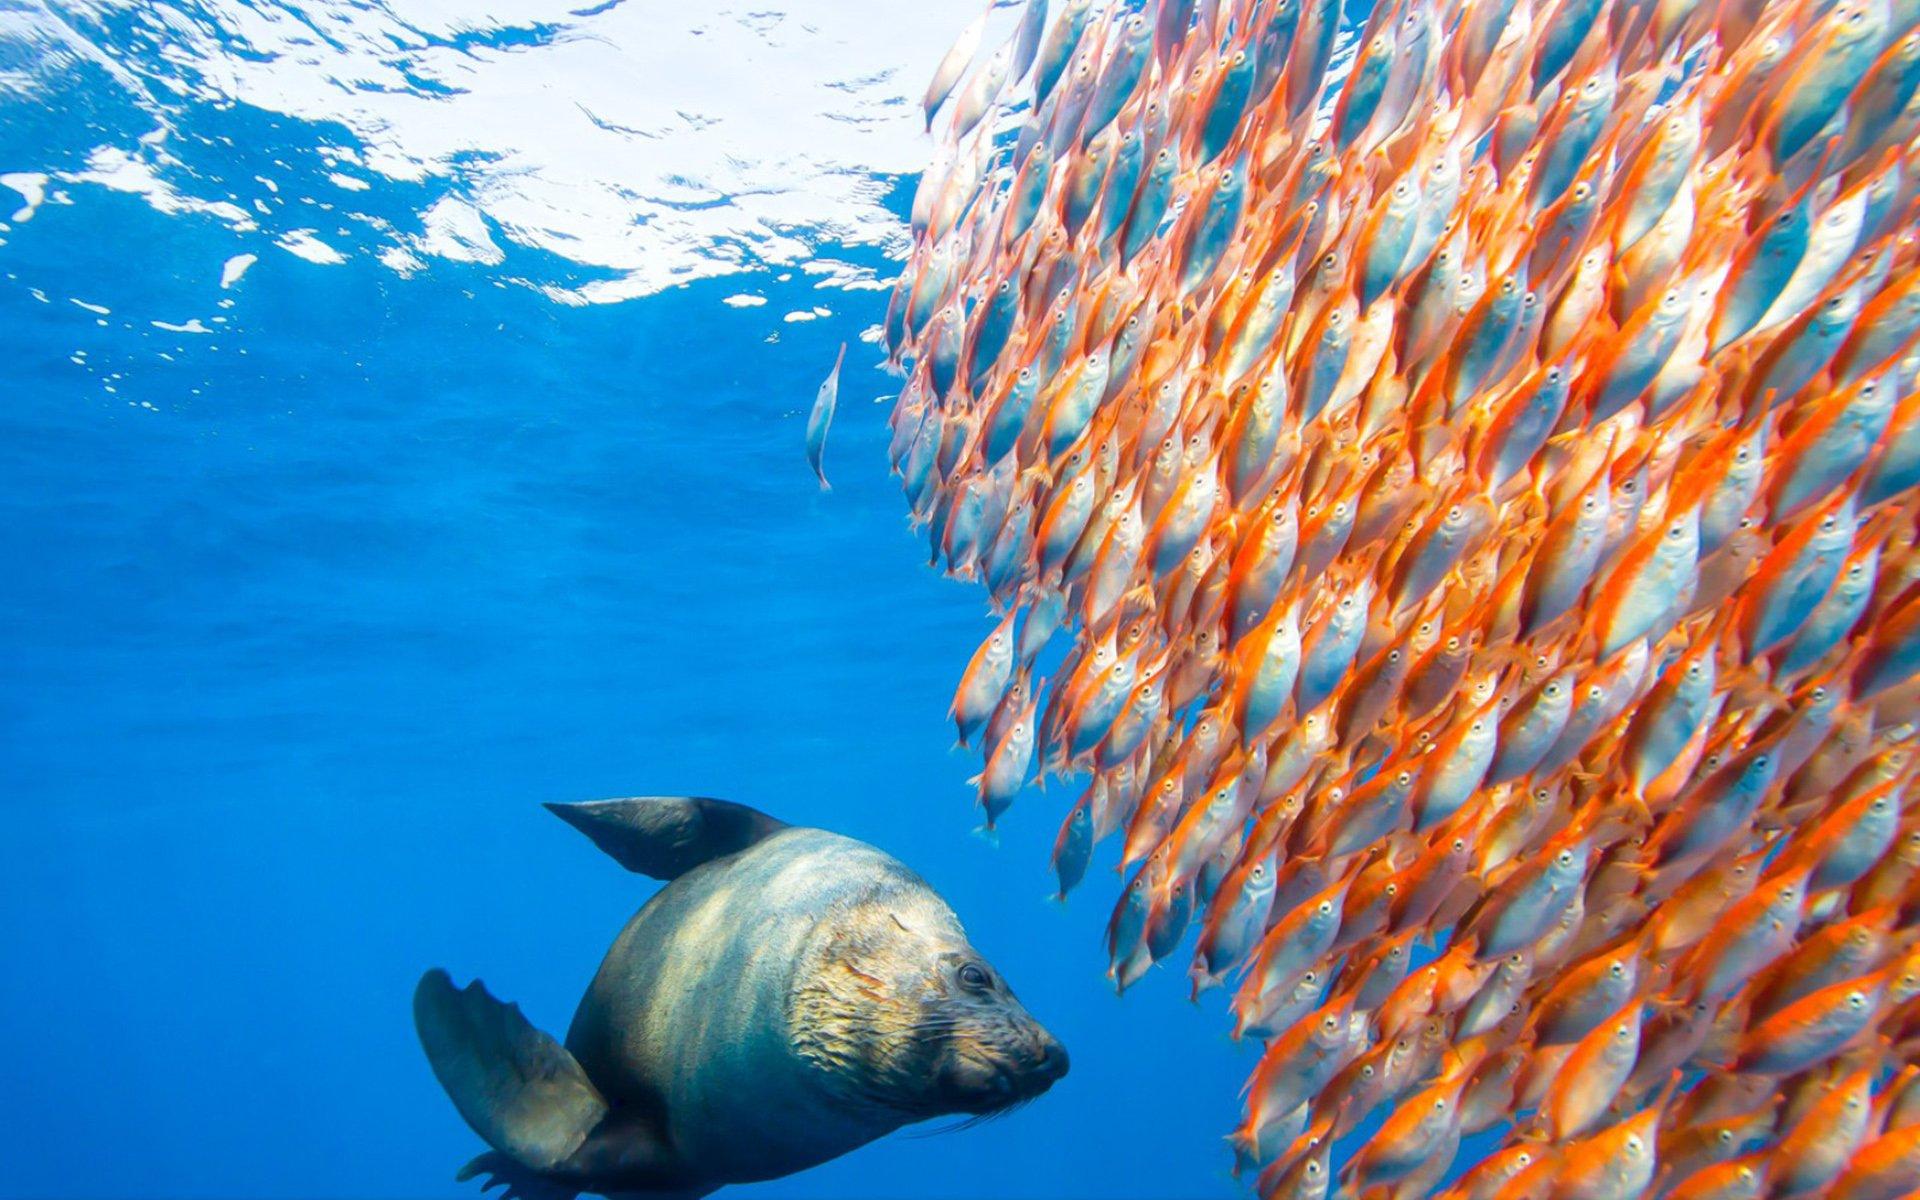 fish marlin desktop 1920x1200 - photo #40